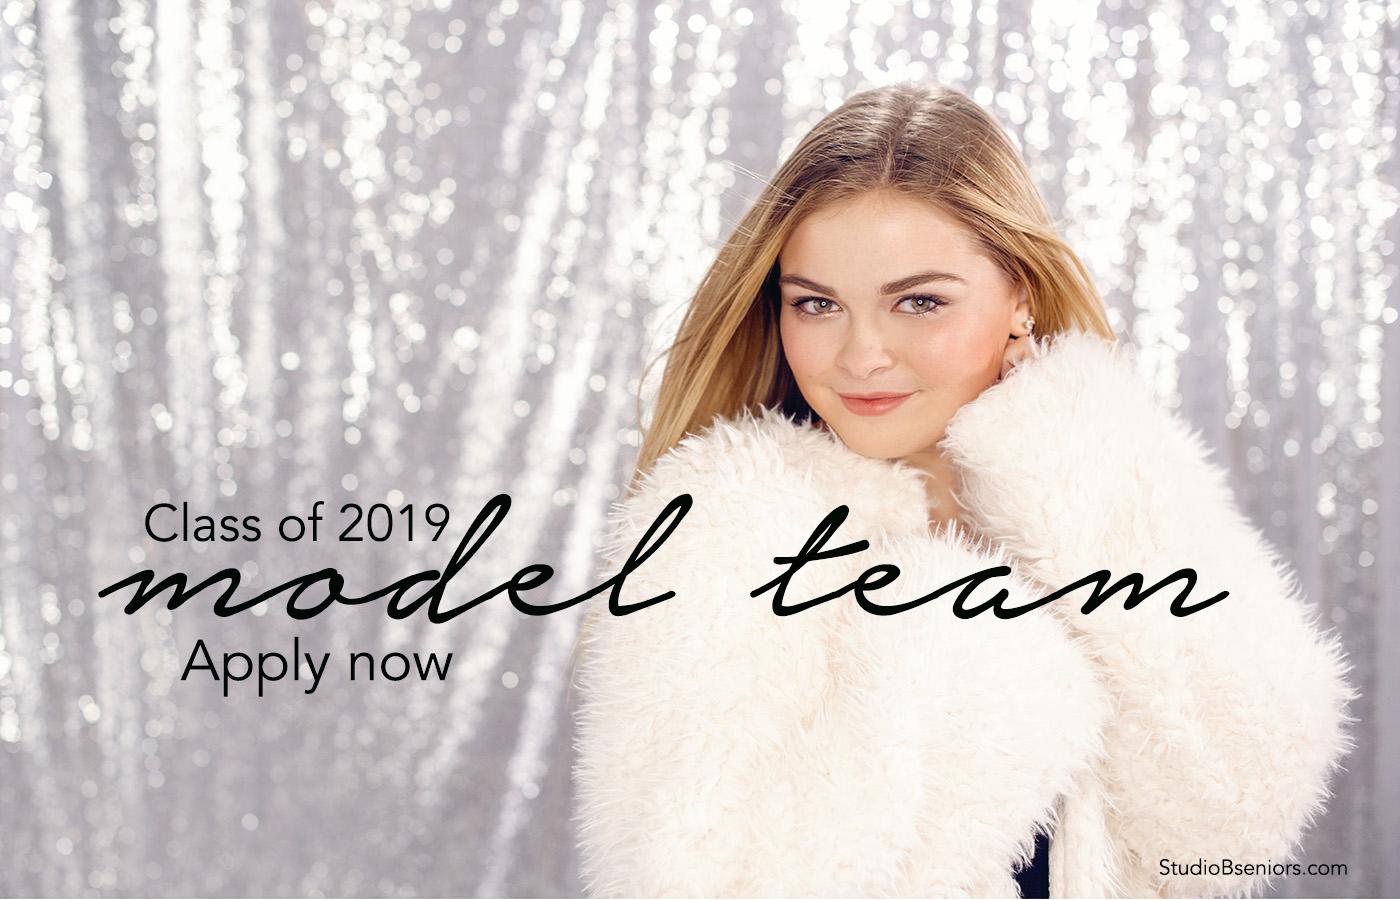 Studio B Seniors_Class of 2019_Model Team_Apply Now_featuring model Bridgette_web.jpg